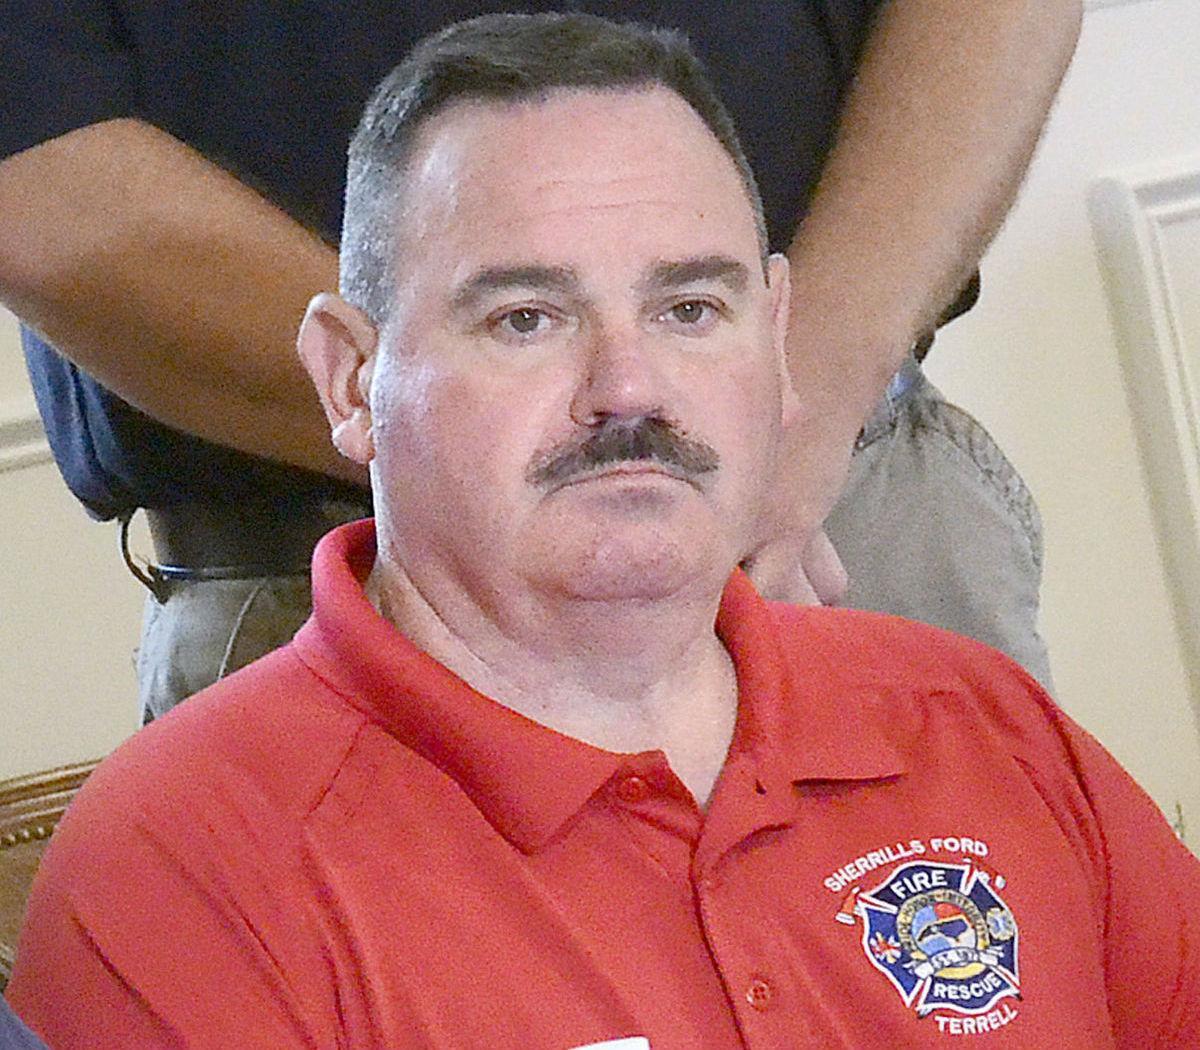 Sherrills Ford Terrell Fire Chief Ncdol Citation